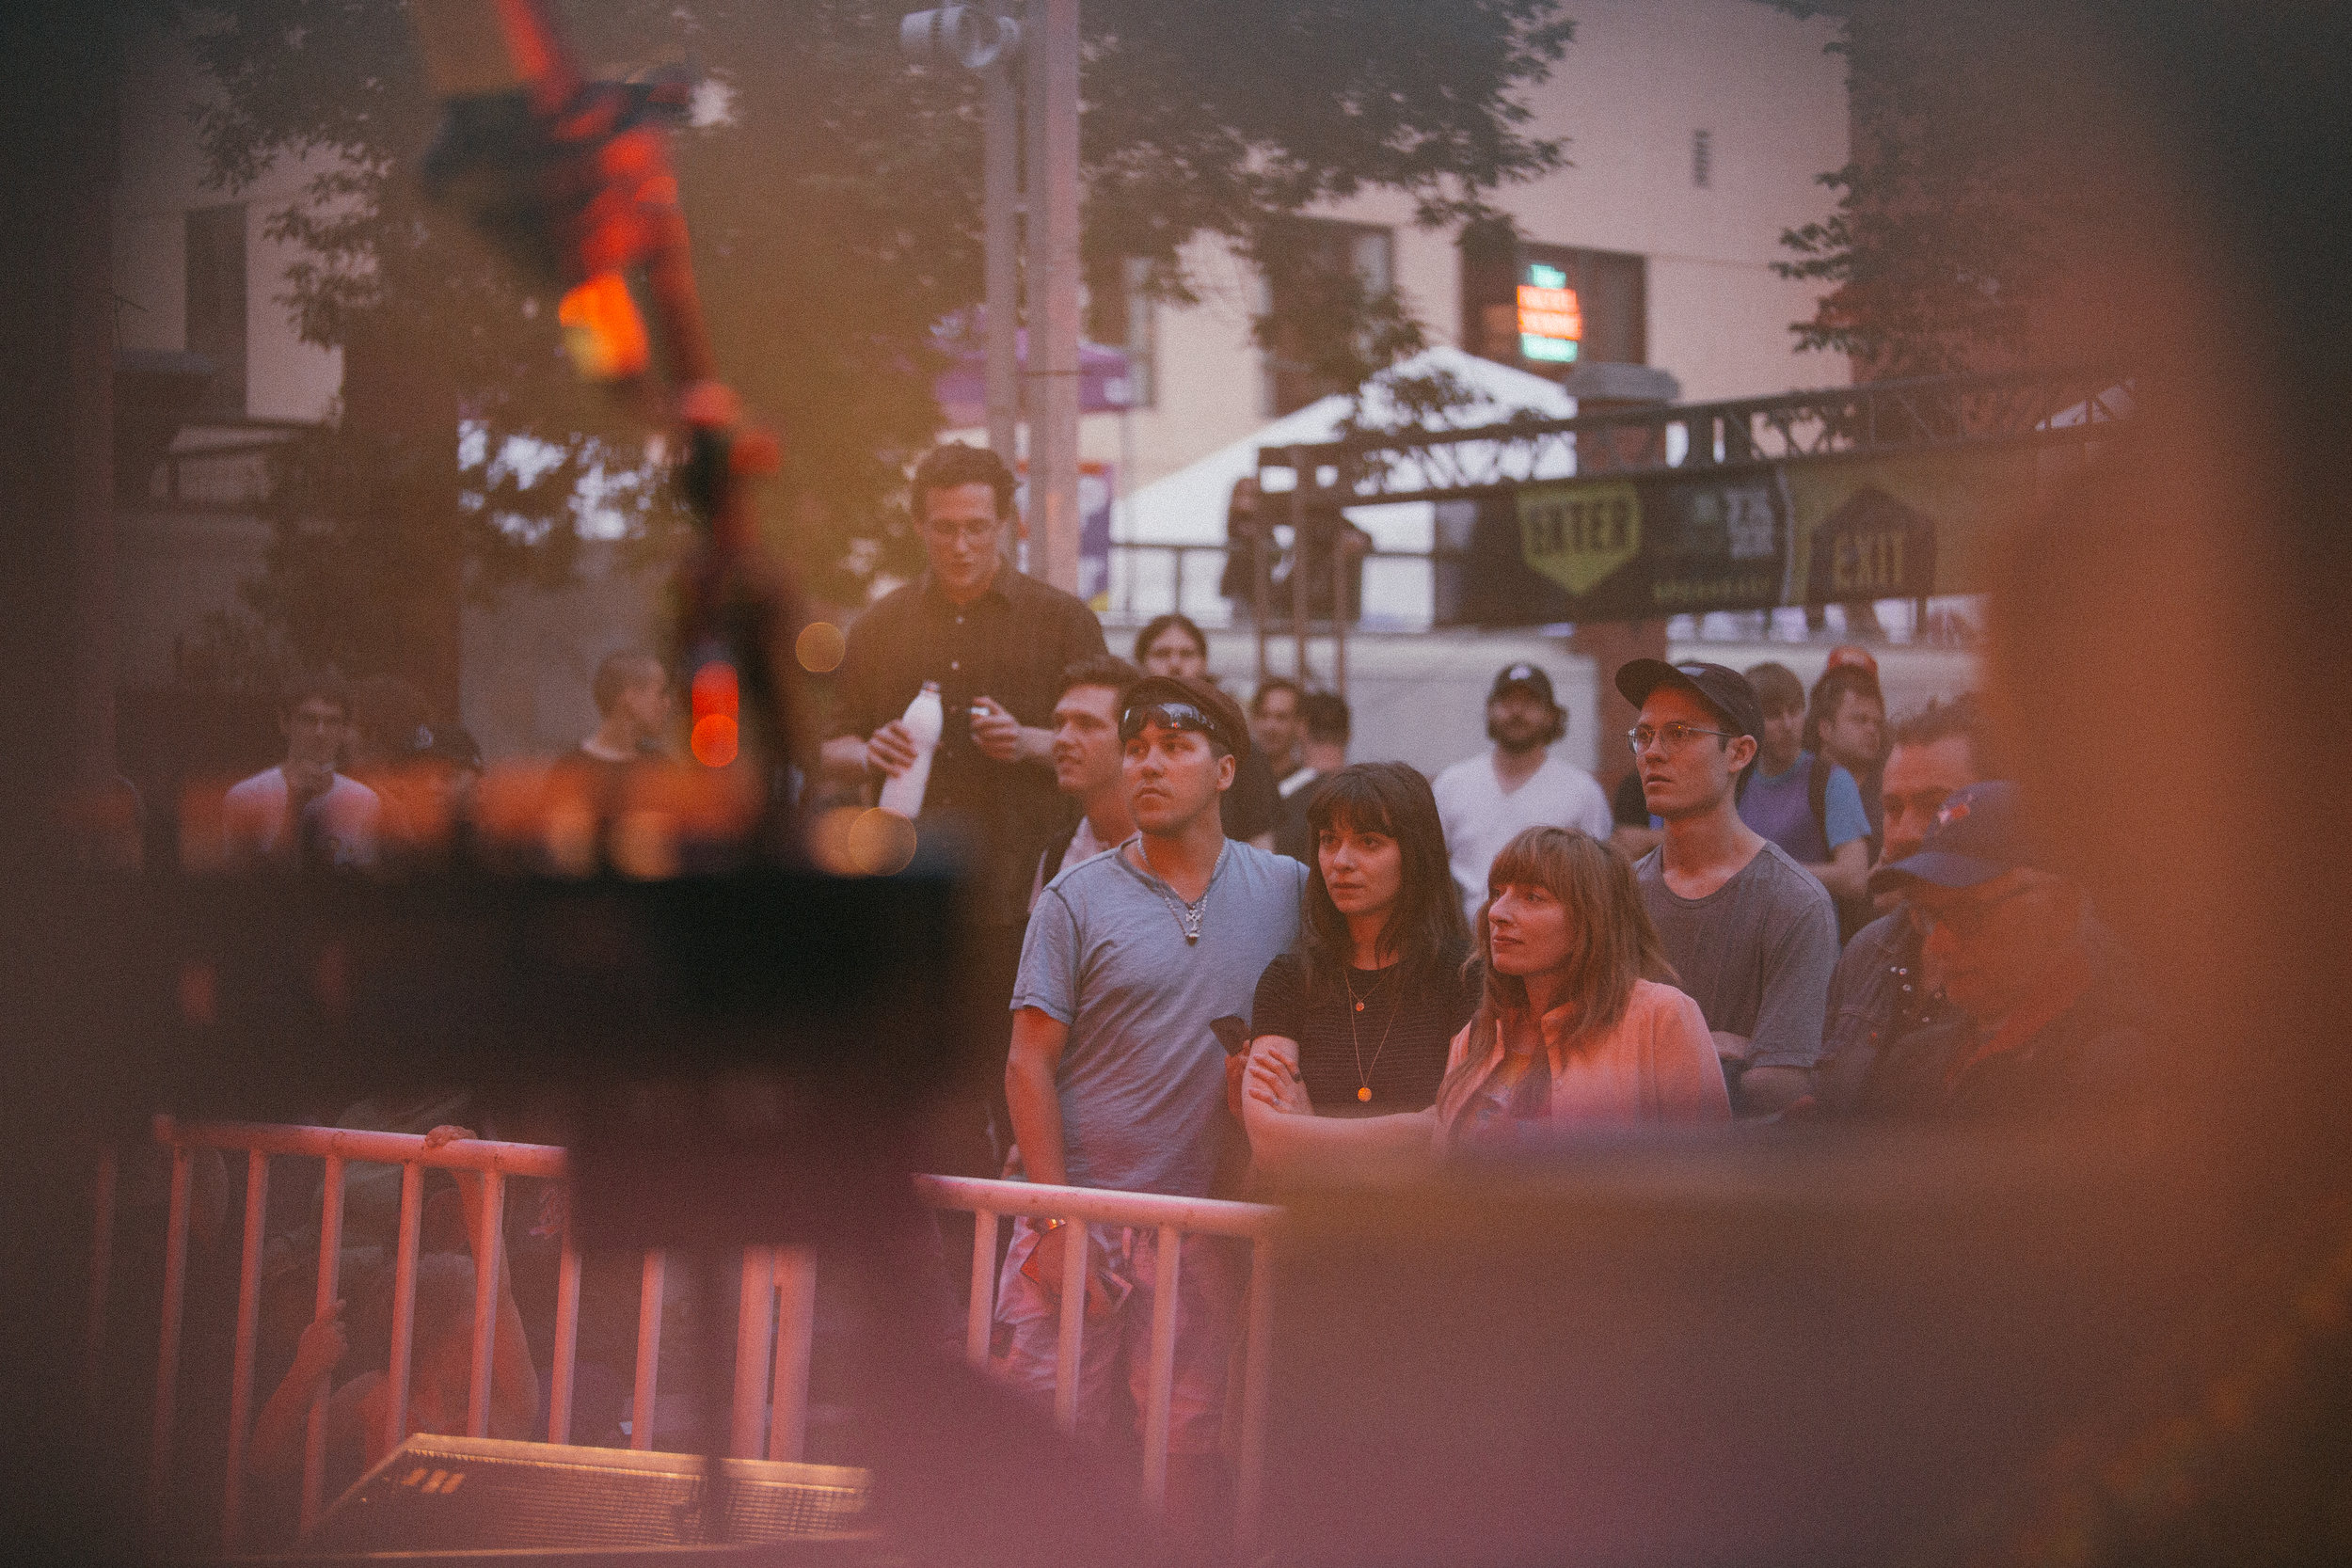 Sun-Jazzfest19-Spaces and faces_byJenDoerksenPhoto-4.jpg